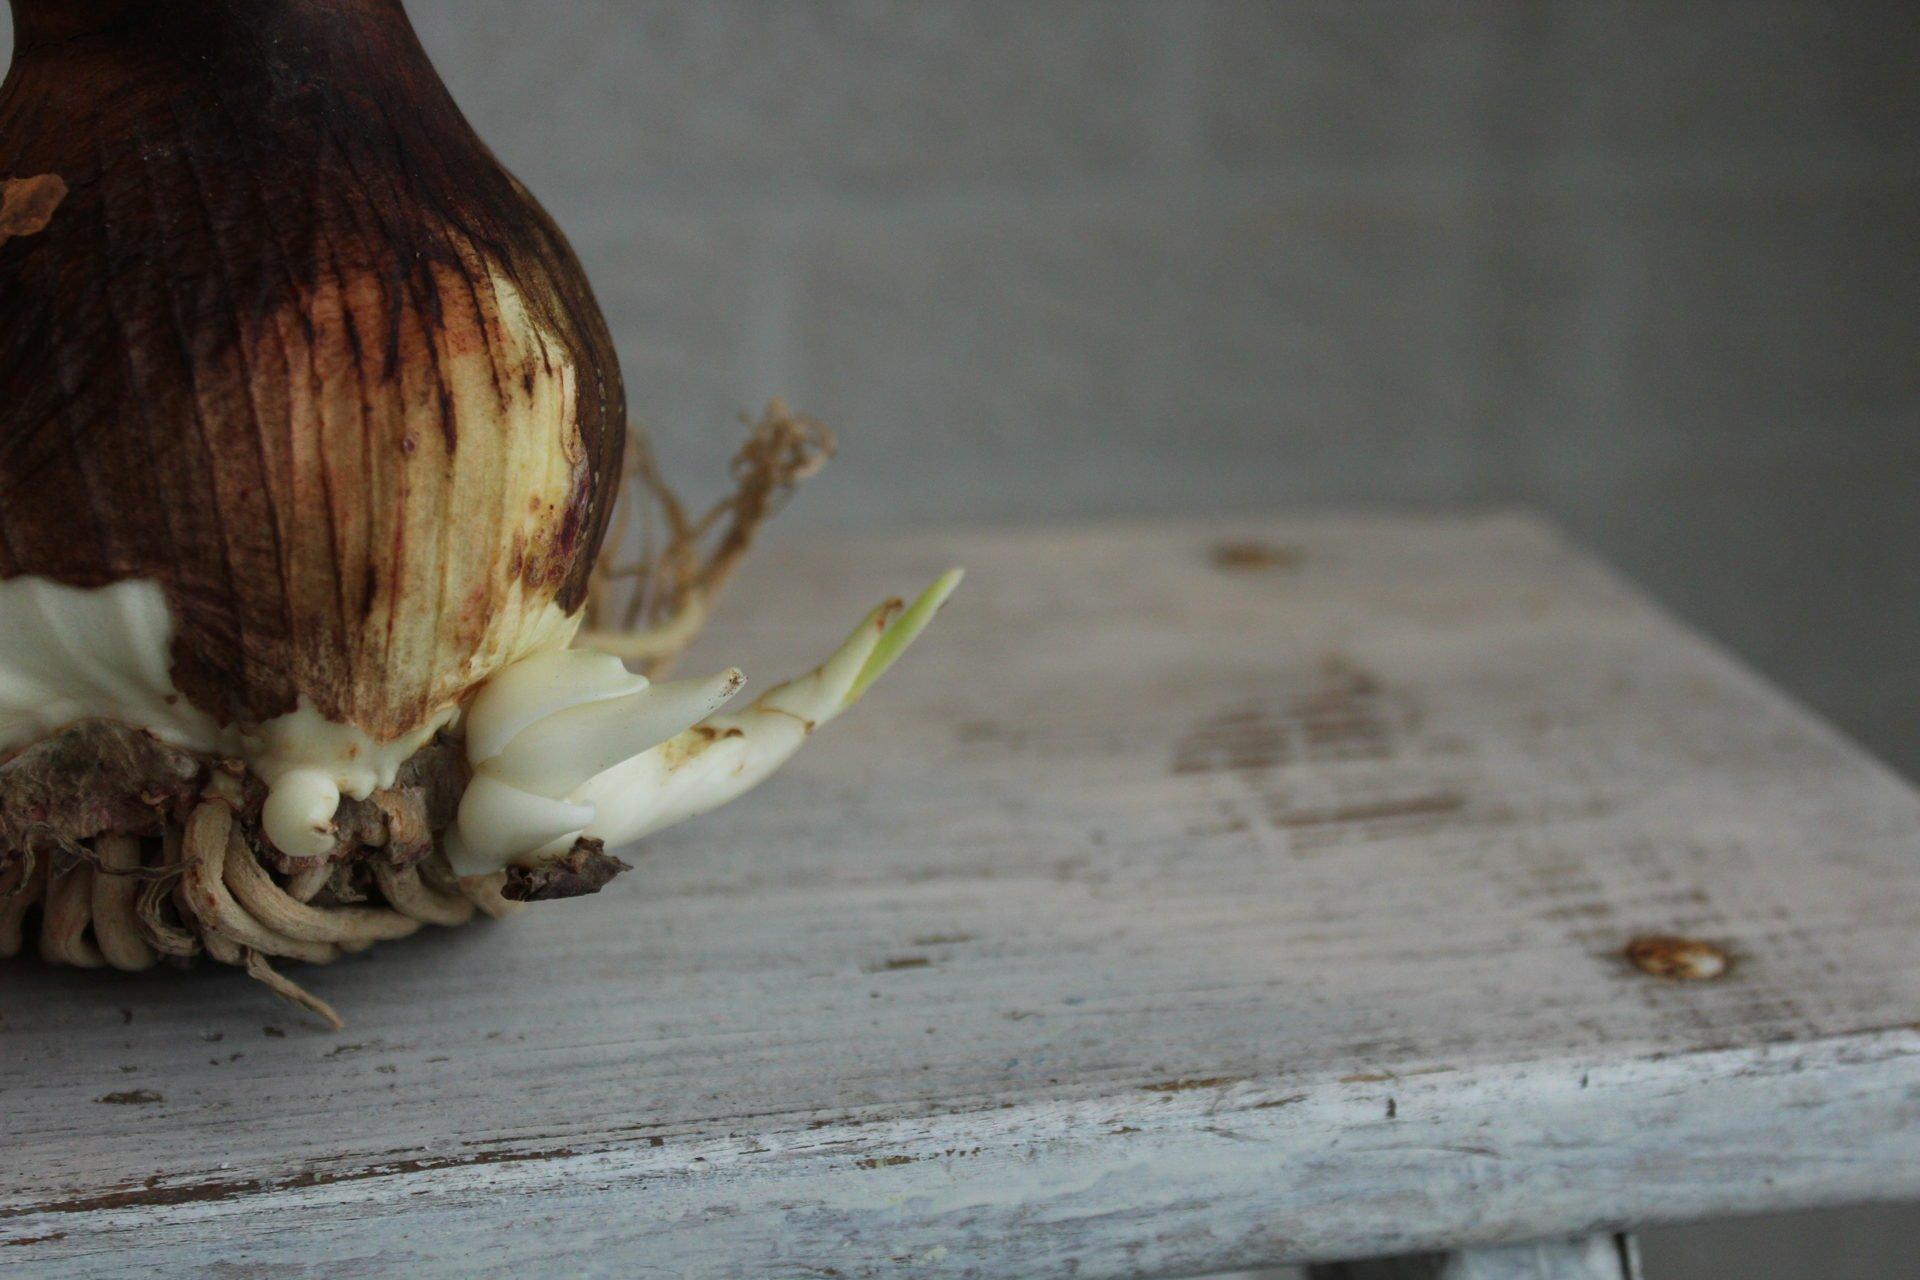 Amaryllis bulblets coming off bulb